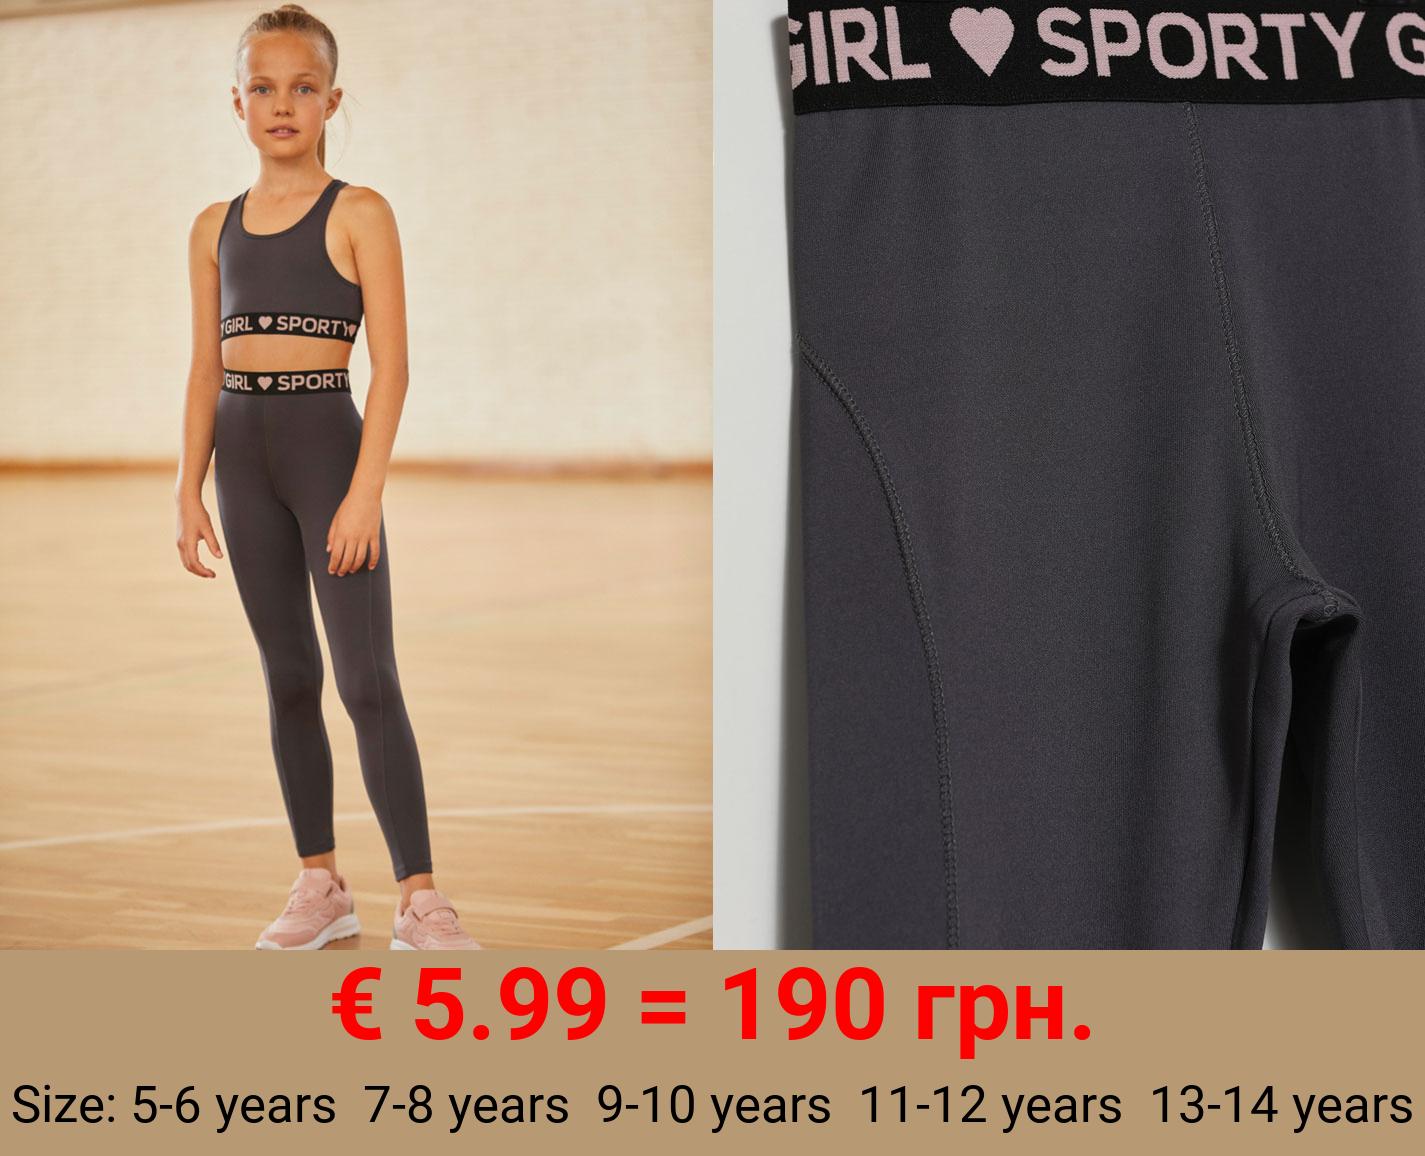 Sports leggings with slogan